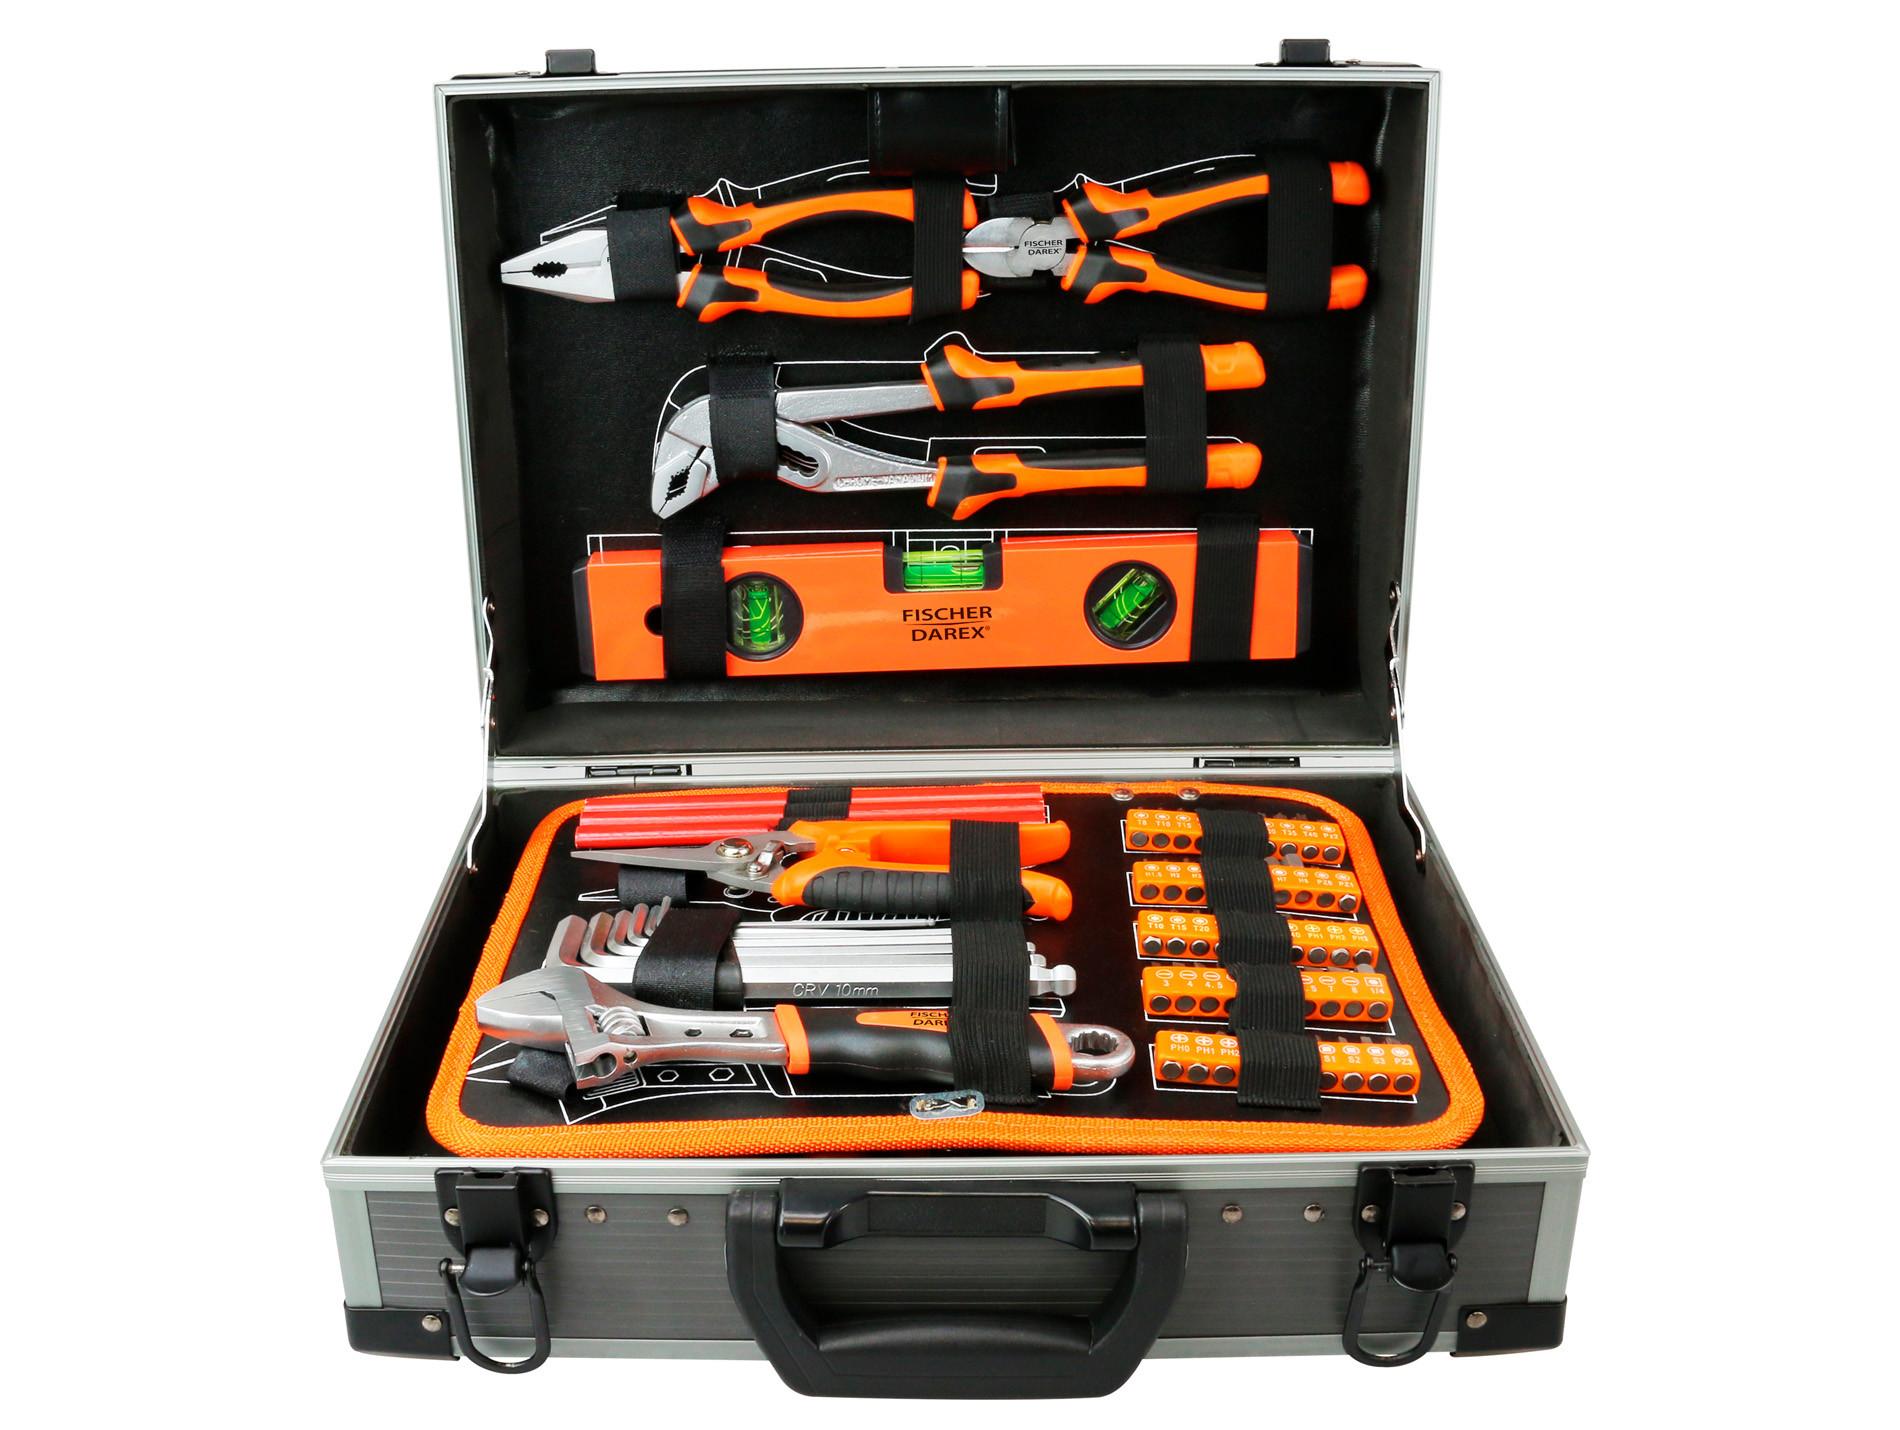 Valise 110 outils de vissage FISCHER DAREX